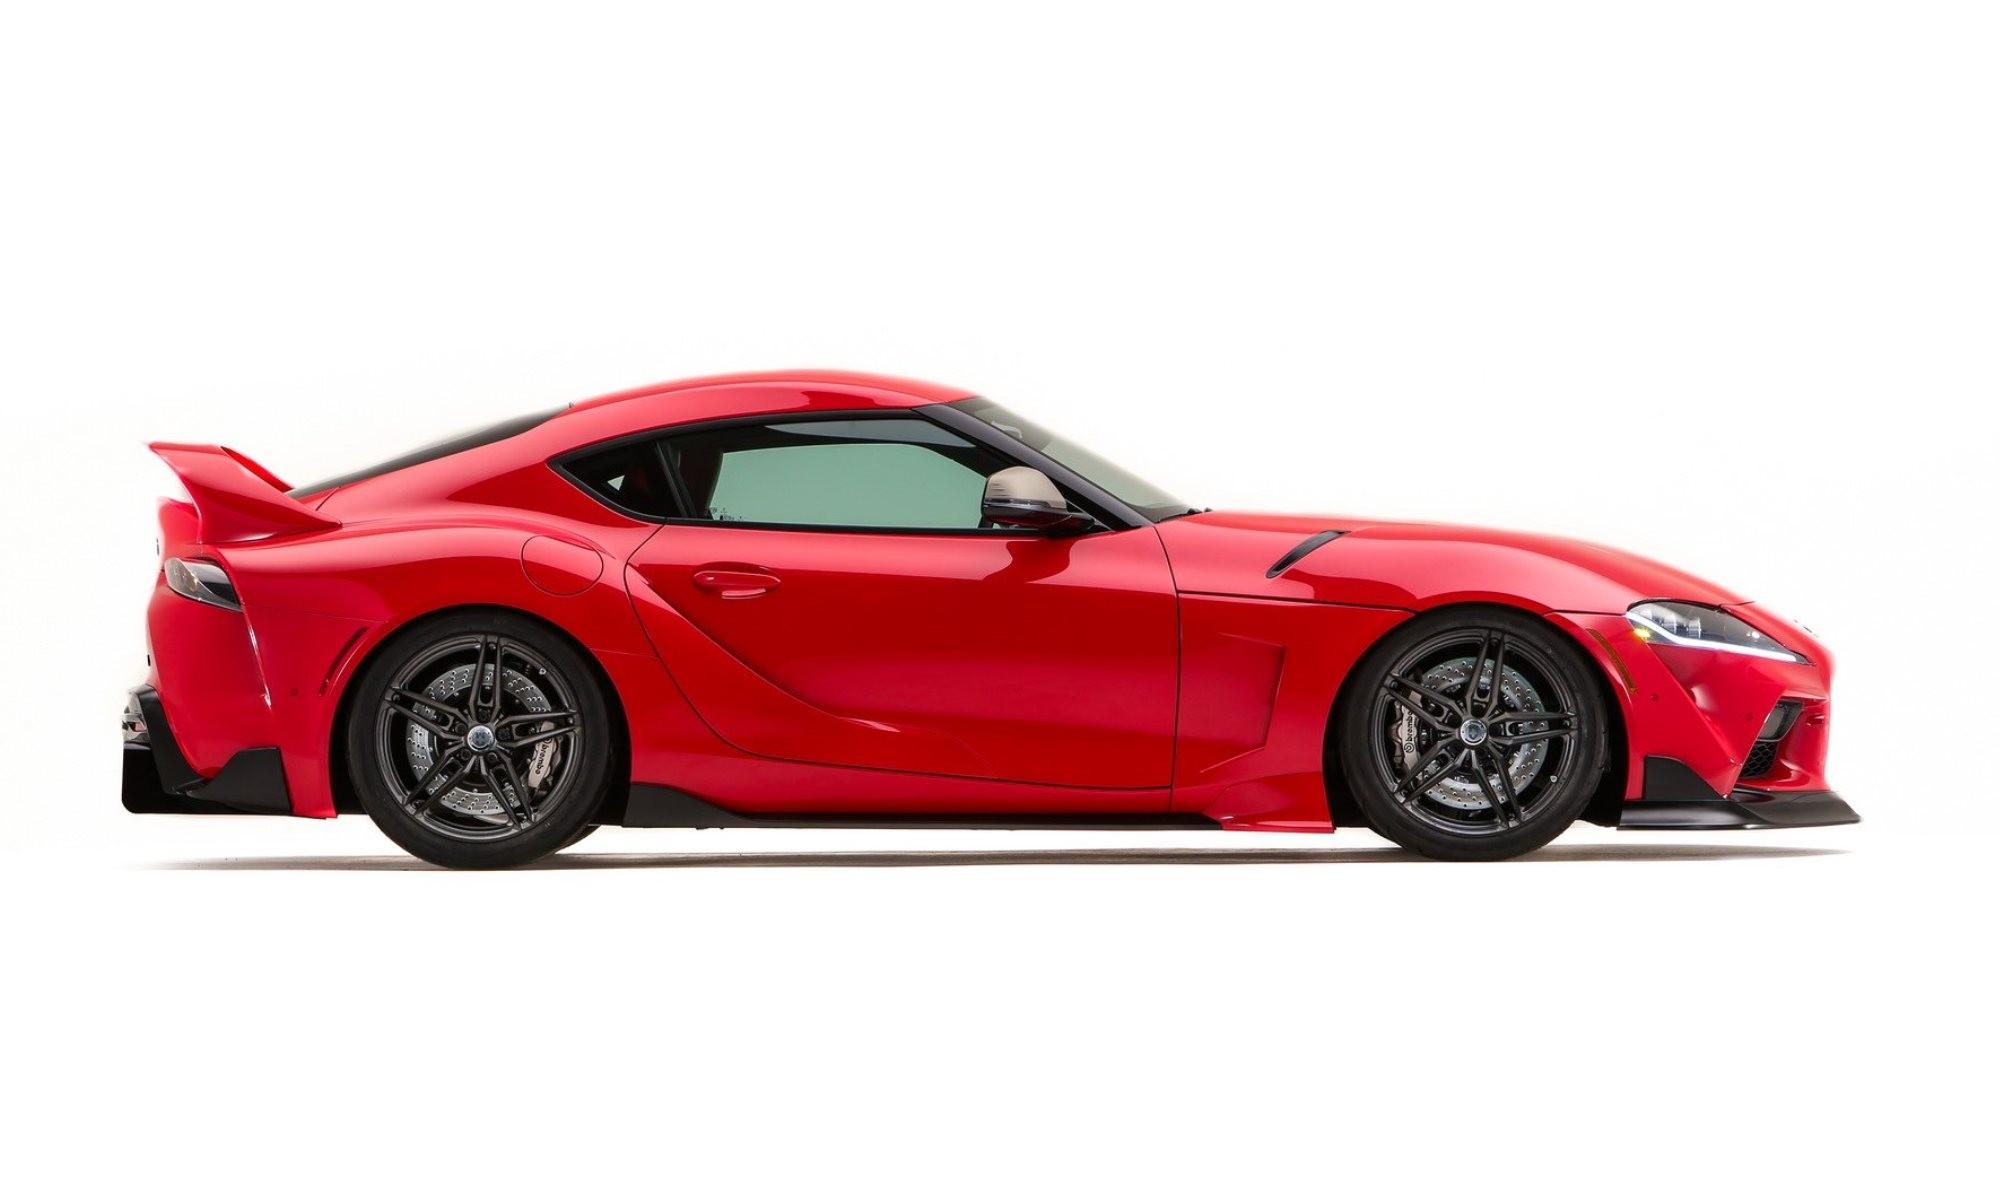 Toyota GR Supra Heritage Edition profile